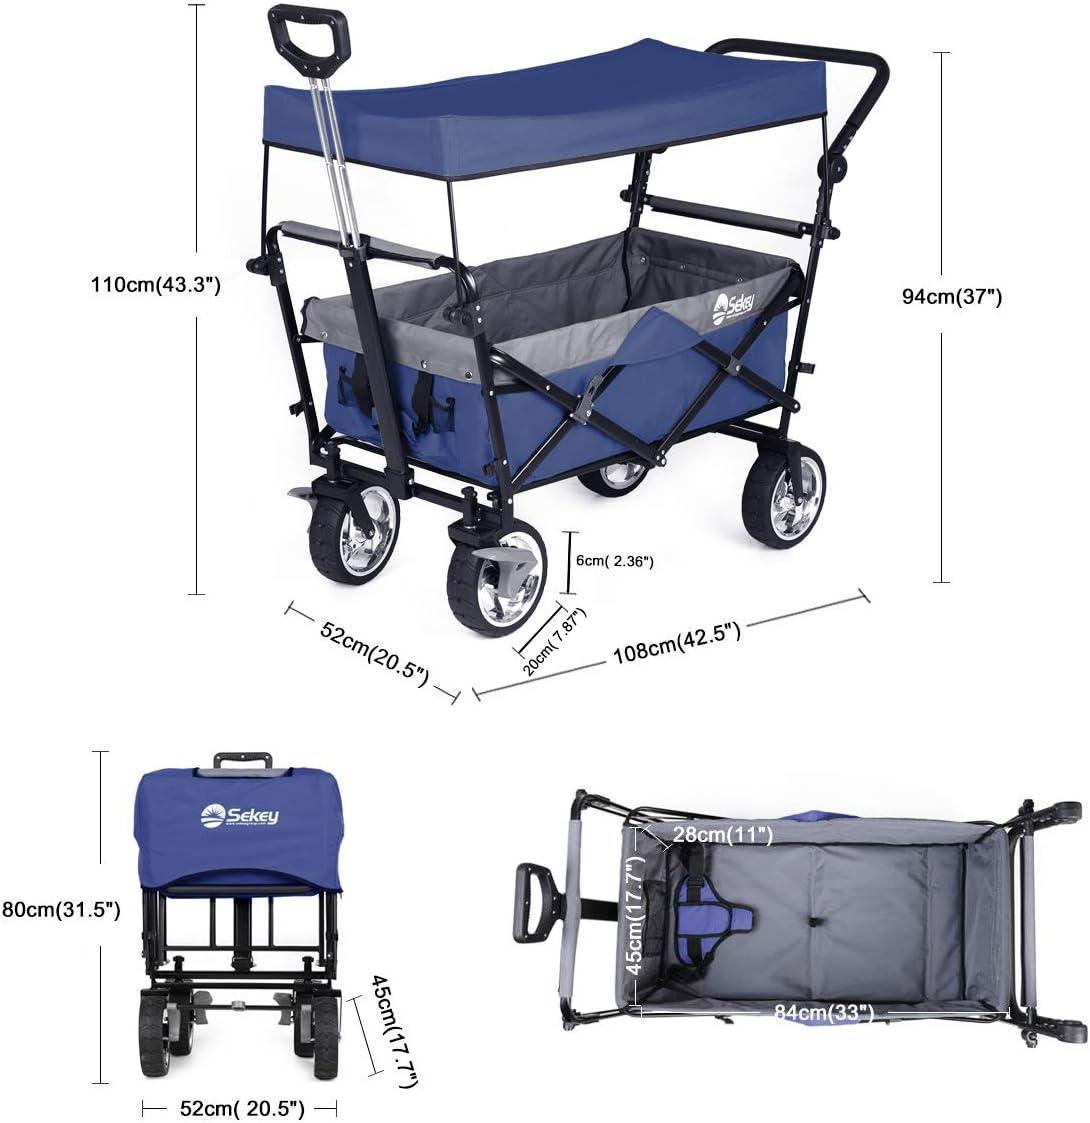 Sekey Carrito Plegable con Techo extra/íble para la Playa para Transporte para Exteriores Carrito para Exteriores para el jard/ín Azul para Cualquier Terreno